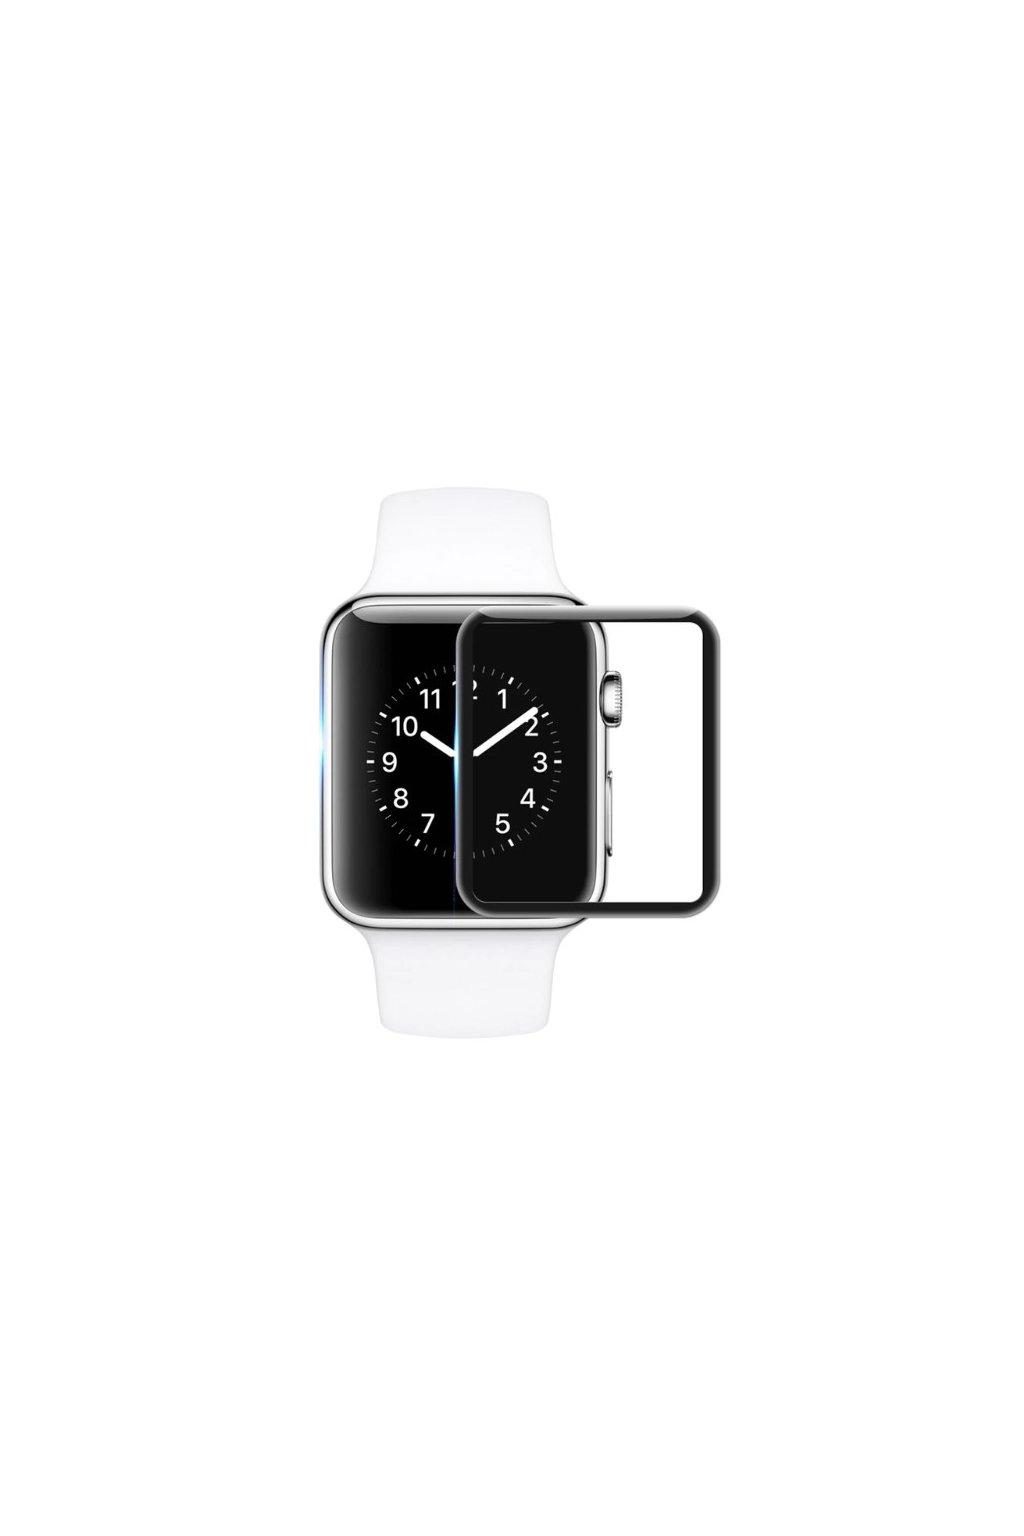 21917 3d tvrzene sklo na apple watch 42x36 mm cerne